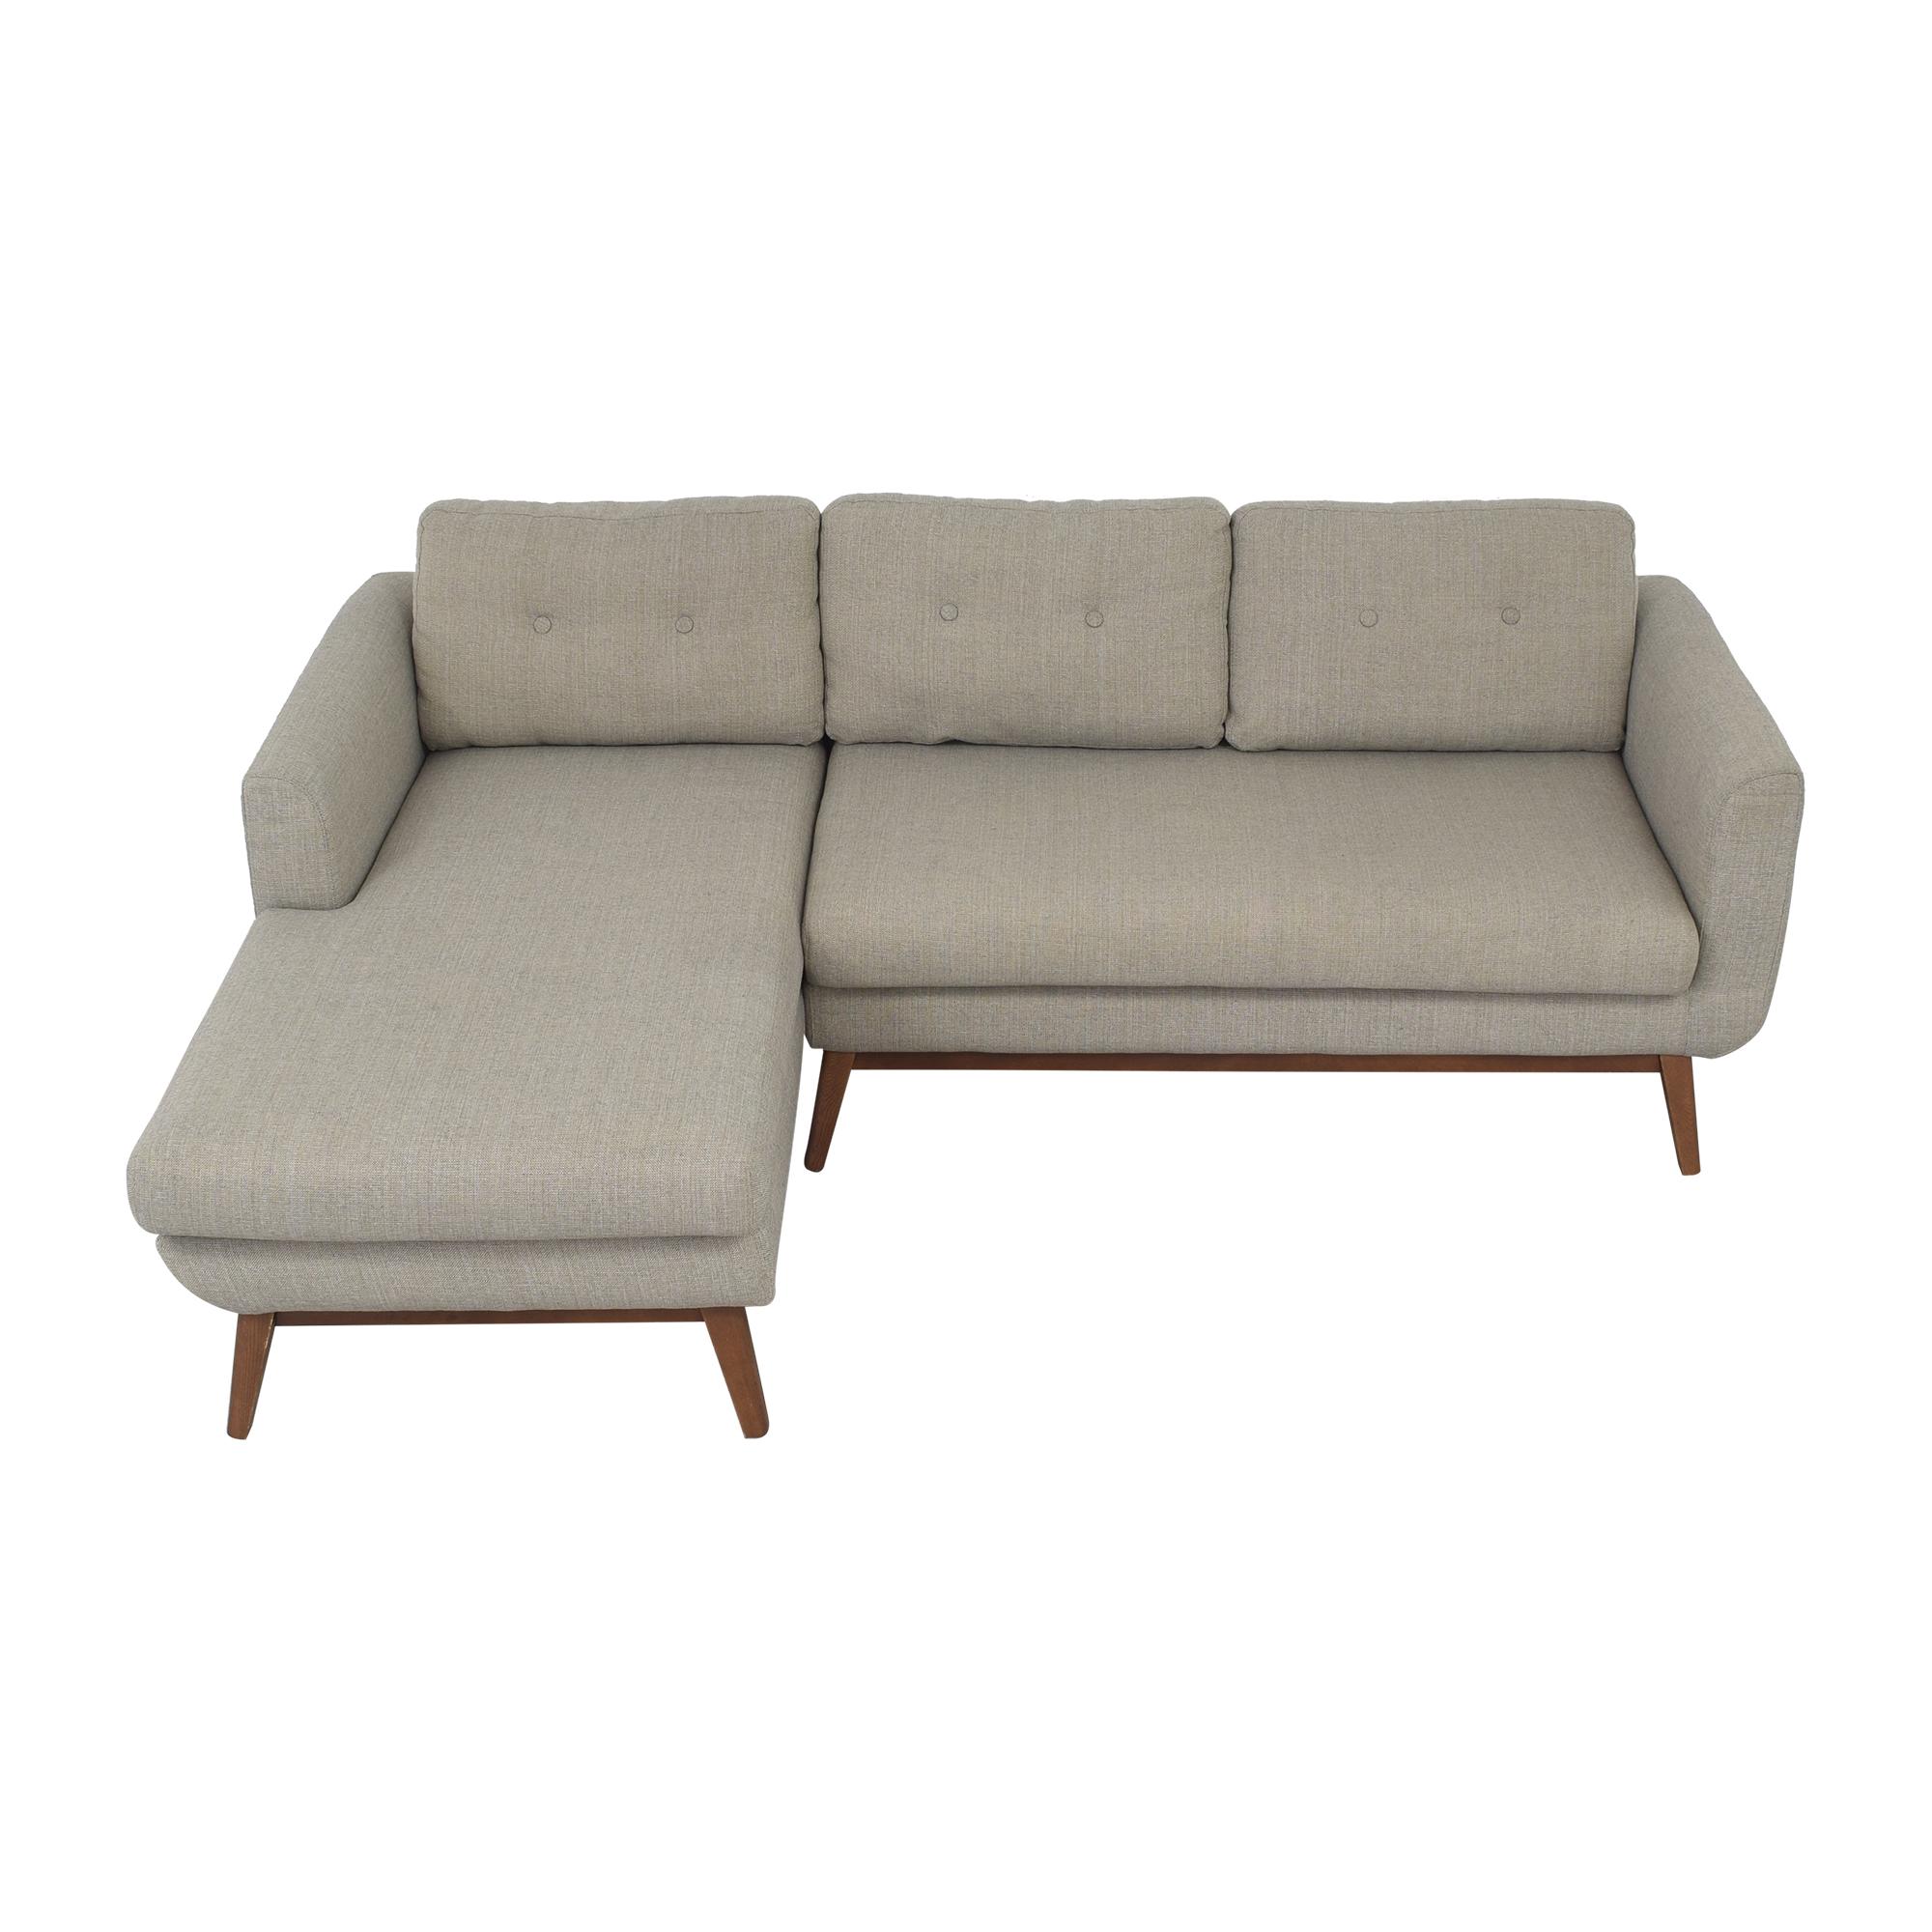 buy AllModern Keating Sofa and Chaise Sectional AllModern Sofas